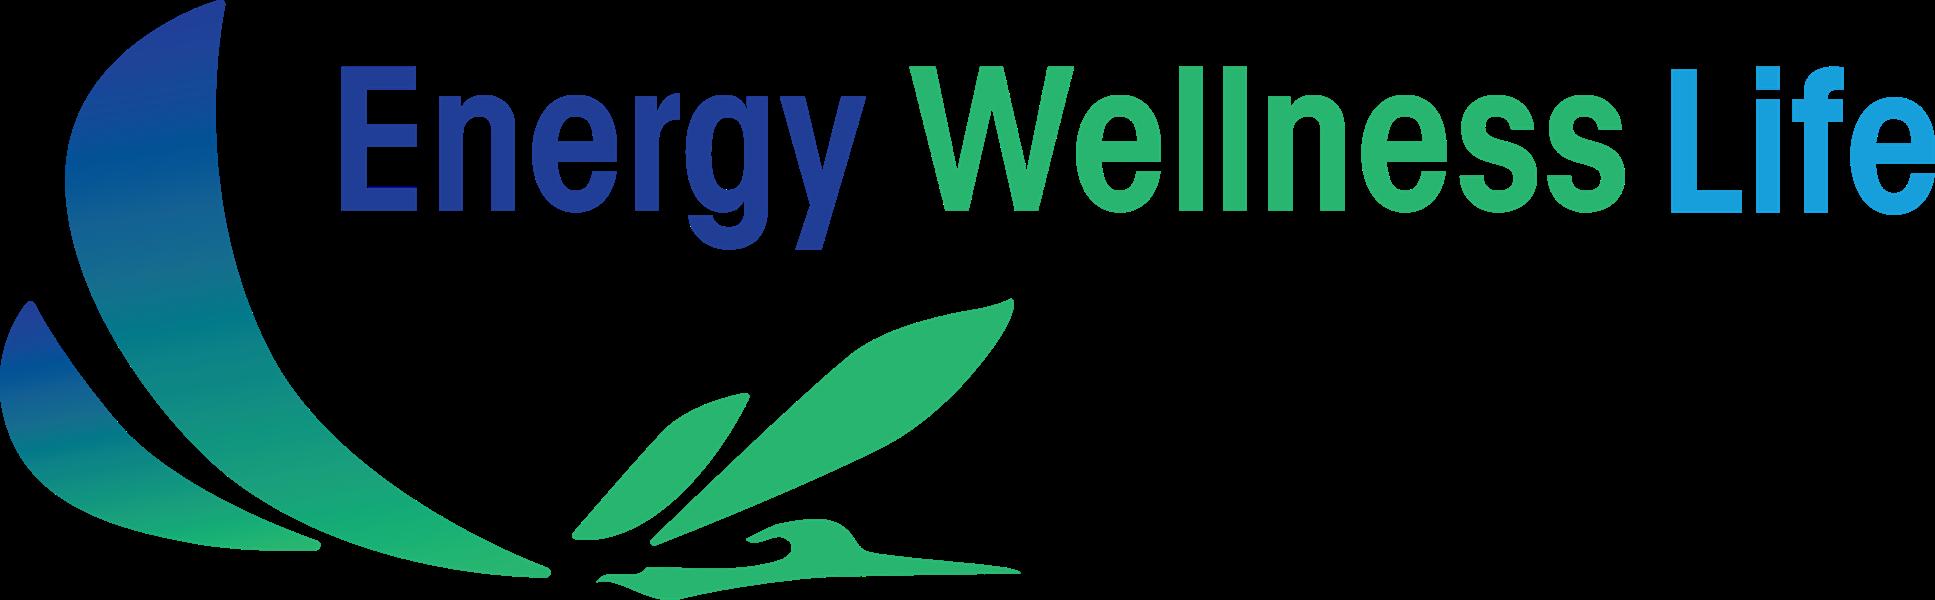 Energy Wellness.Life